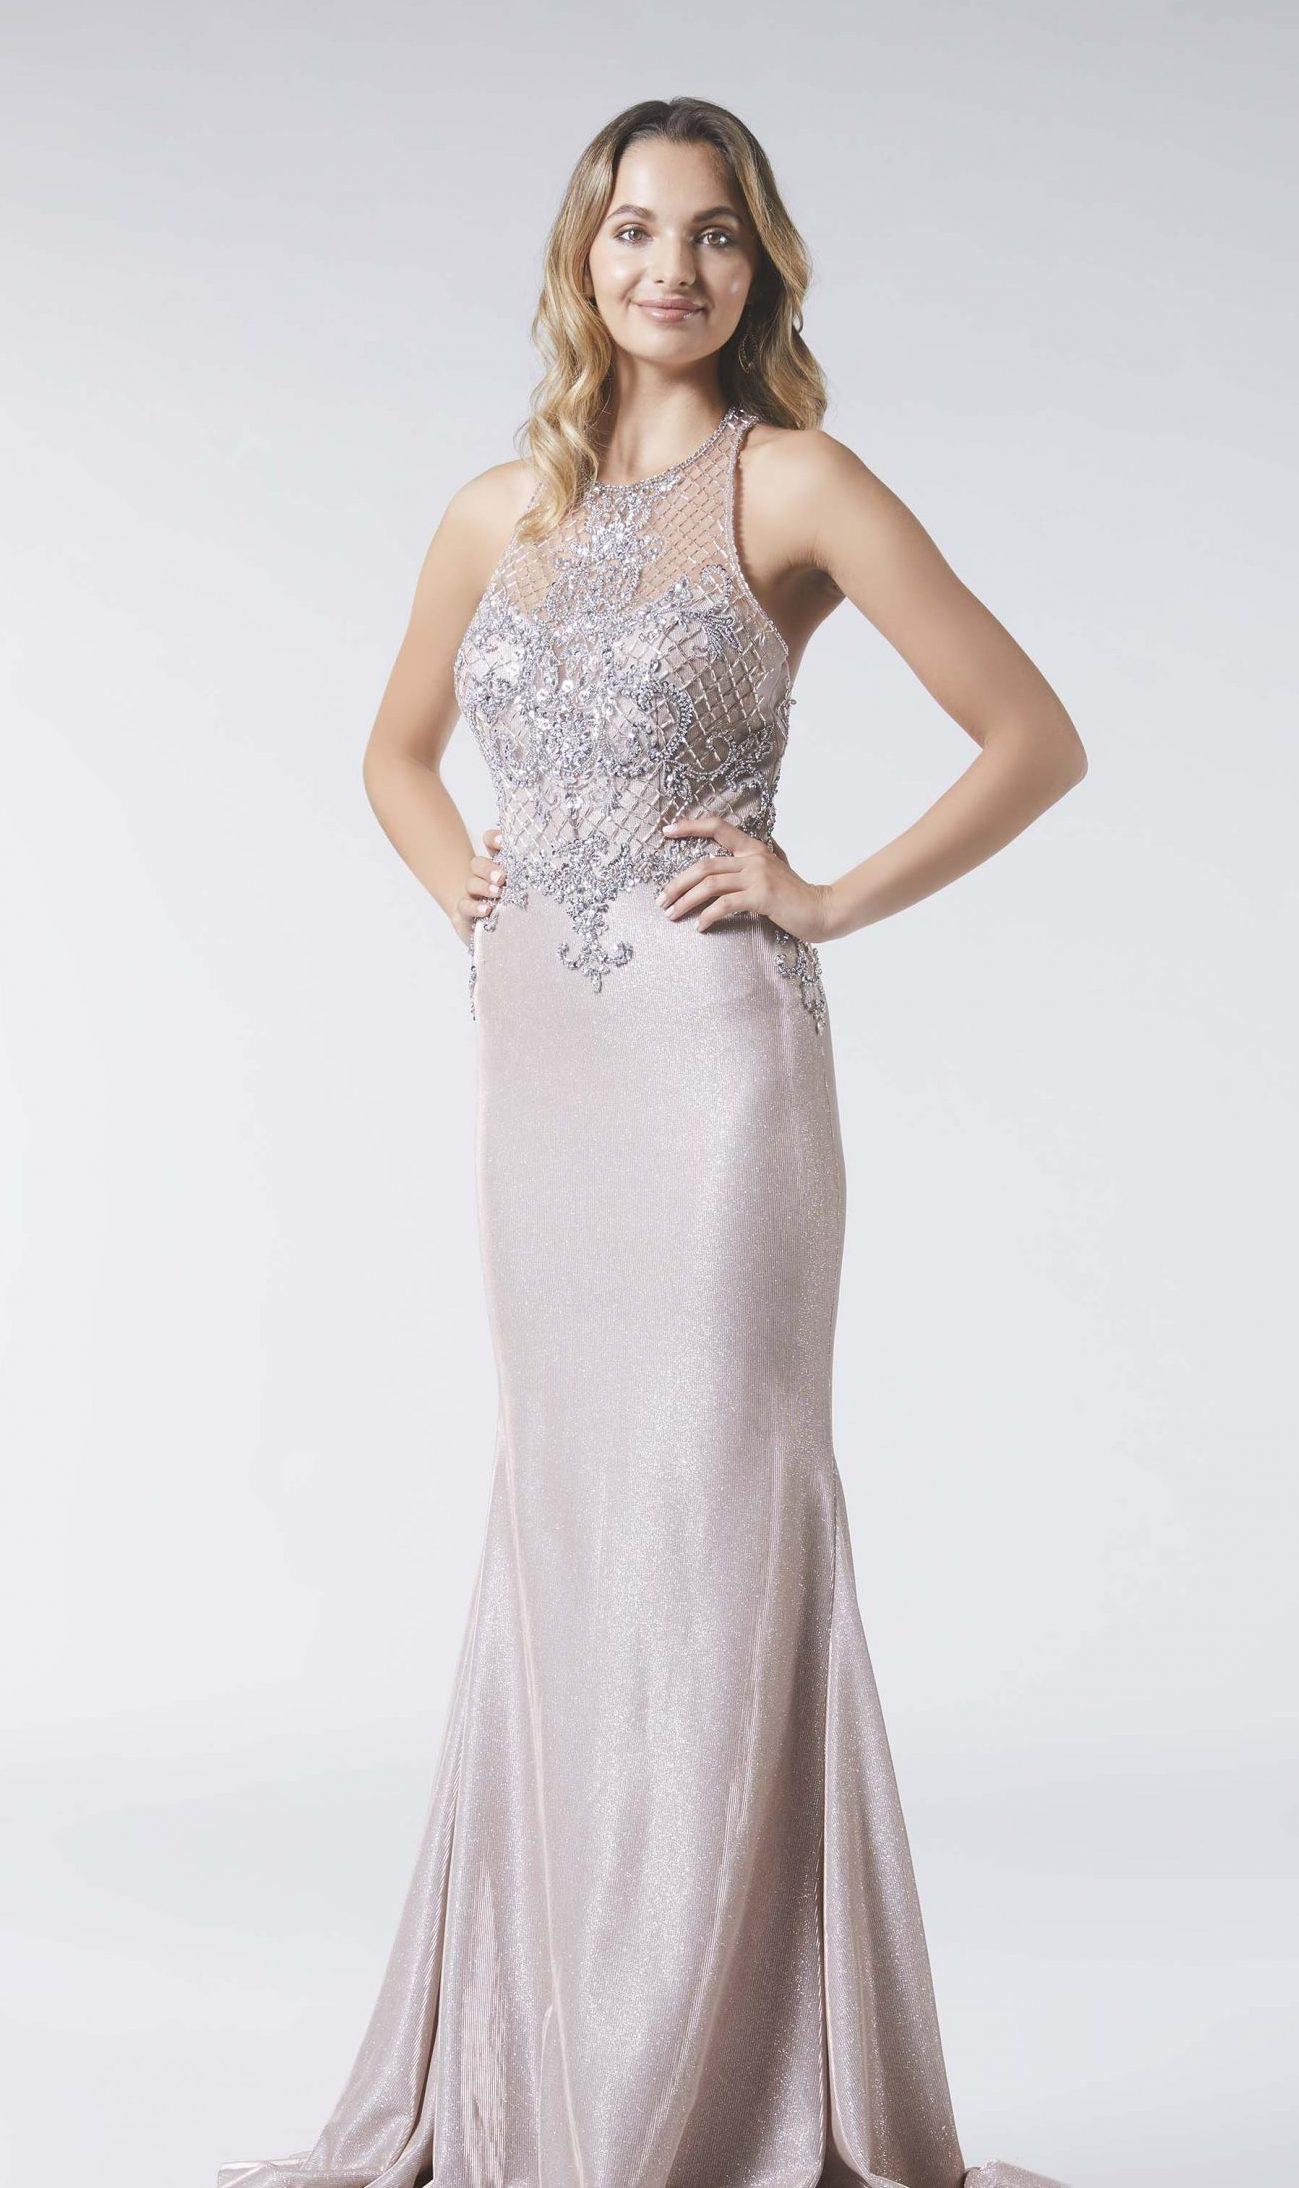 Beaded Dresses On Sale,Tiffany Style Prom Dresses,Champagne Silver Dress,beaded dress,beaded dress,